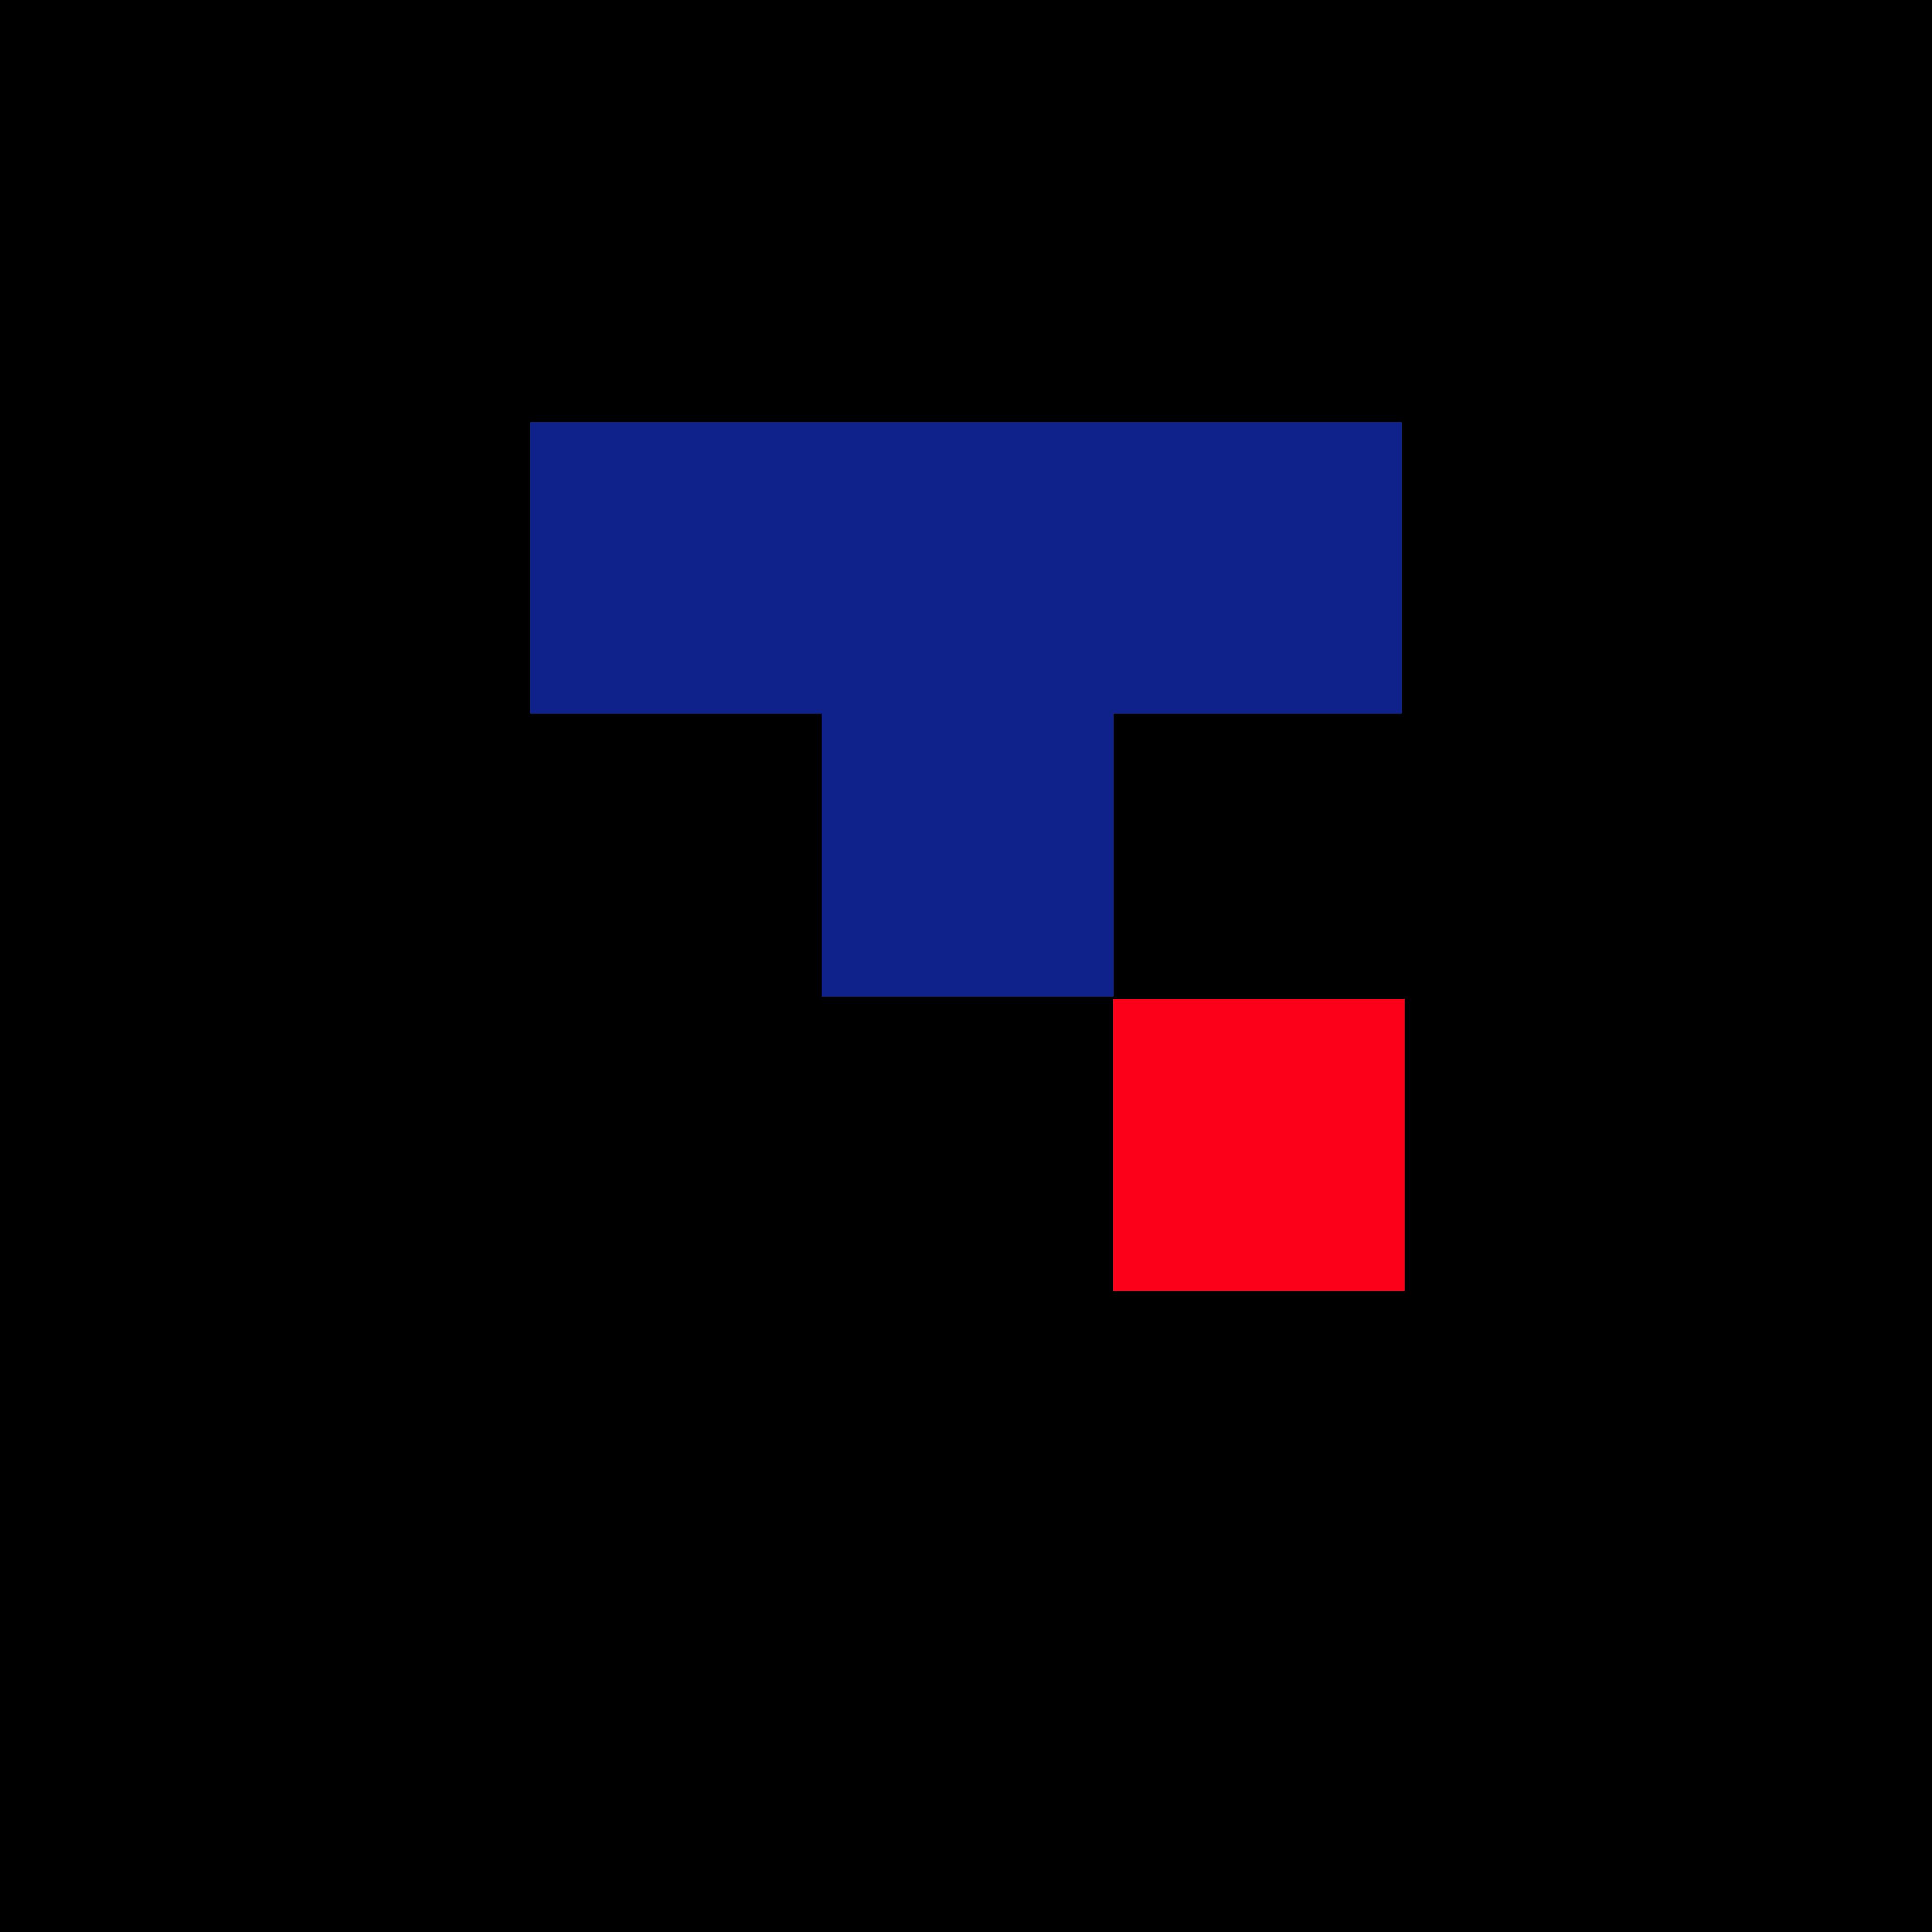 tokyo gas logo 0 - Tokyo Gas Logo